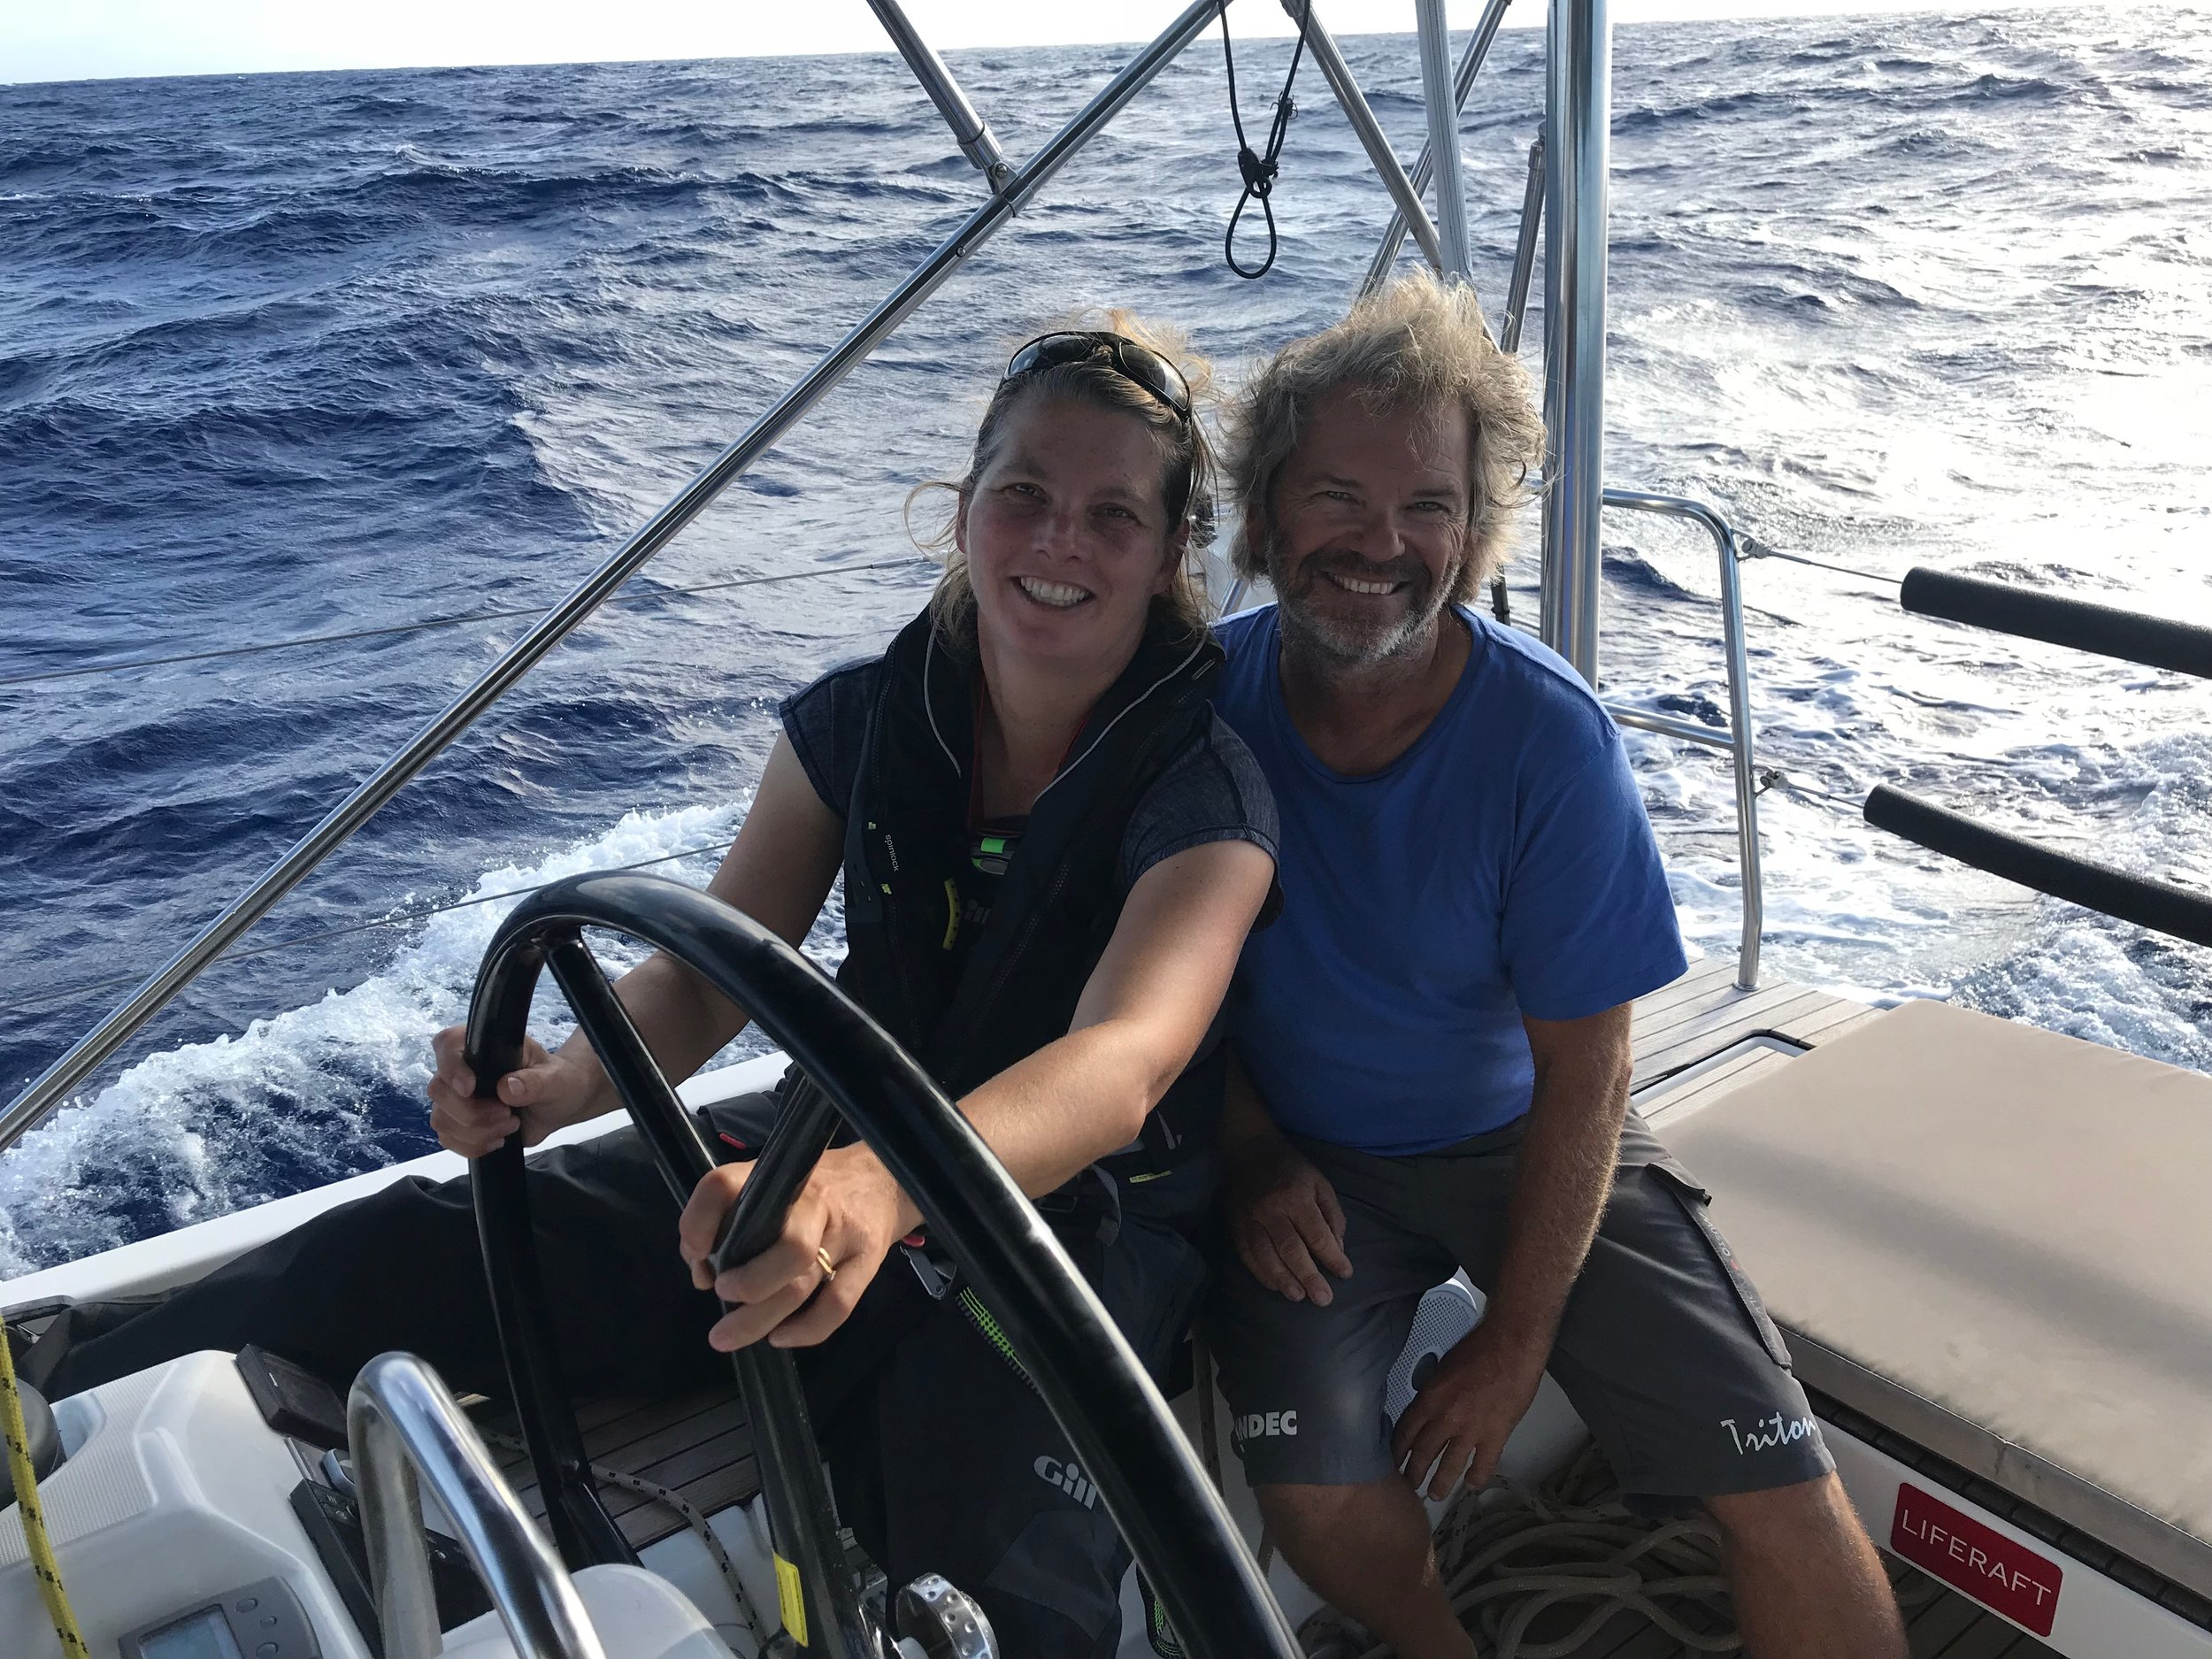 Matt and Jenny - long term sailing friends reunited